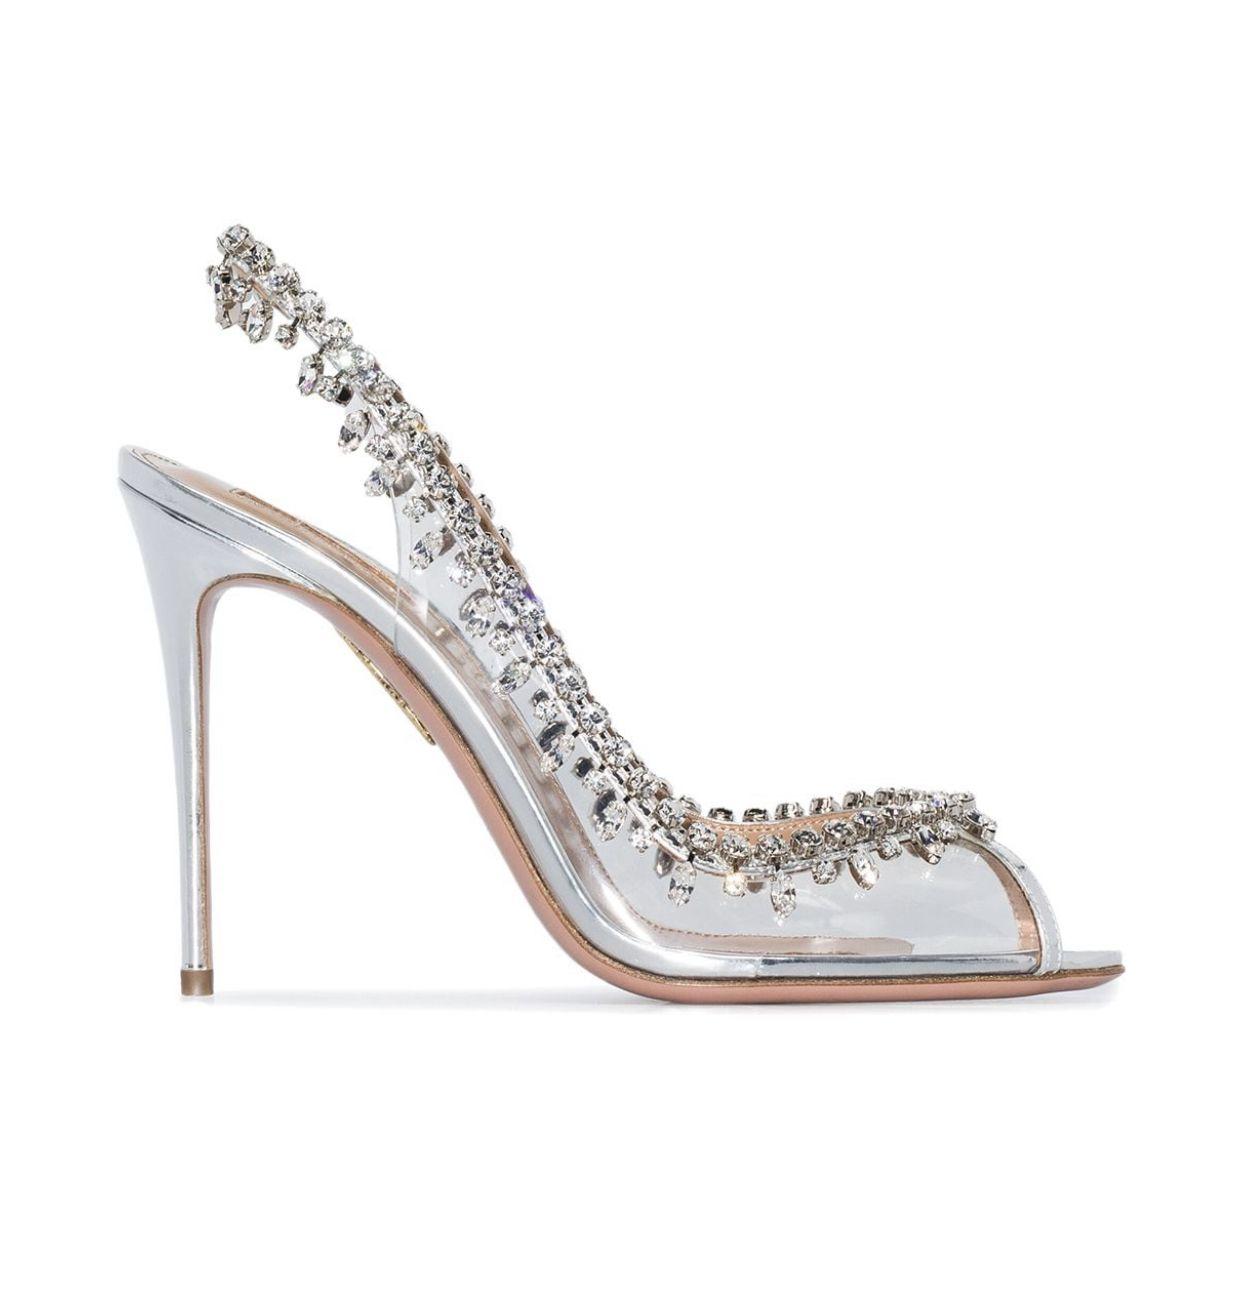 Pin By Erin O Grady On Shoes In 2020 Heels Fancy Accessories Wedding Shoes